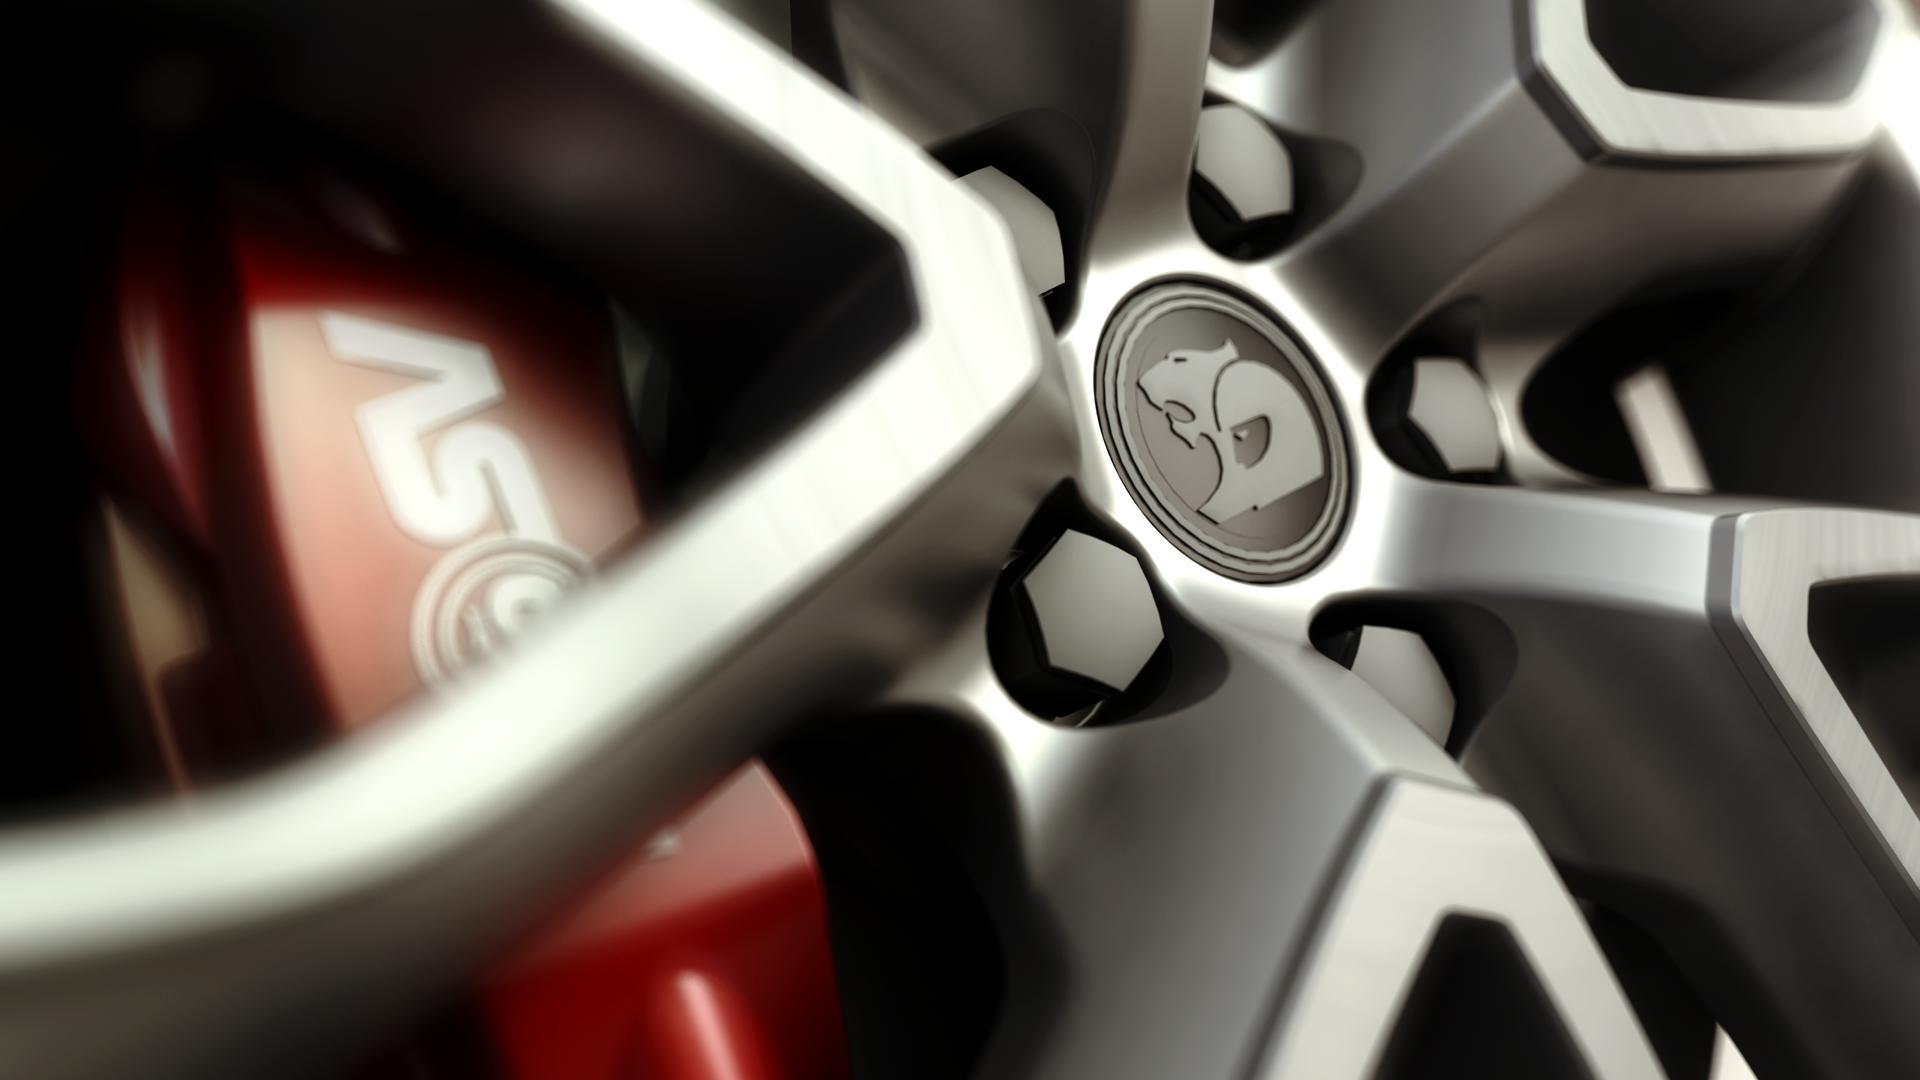 Wallpaper 3D Kendaraan CGI Merapatkan Rims Setir